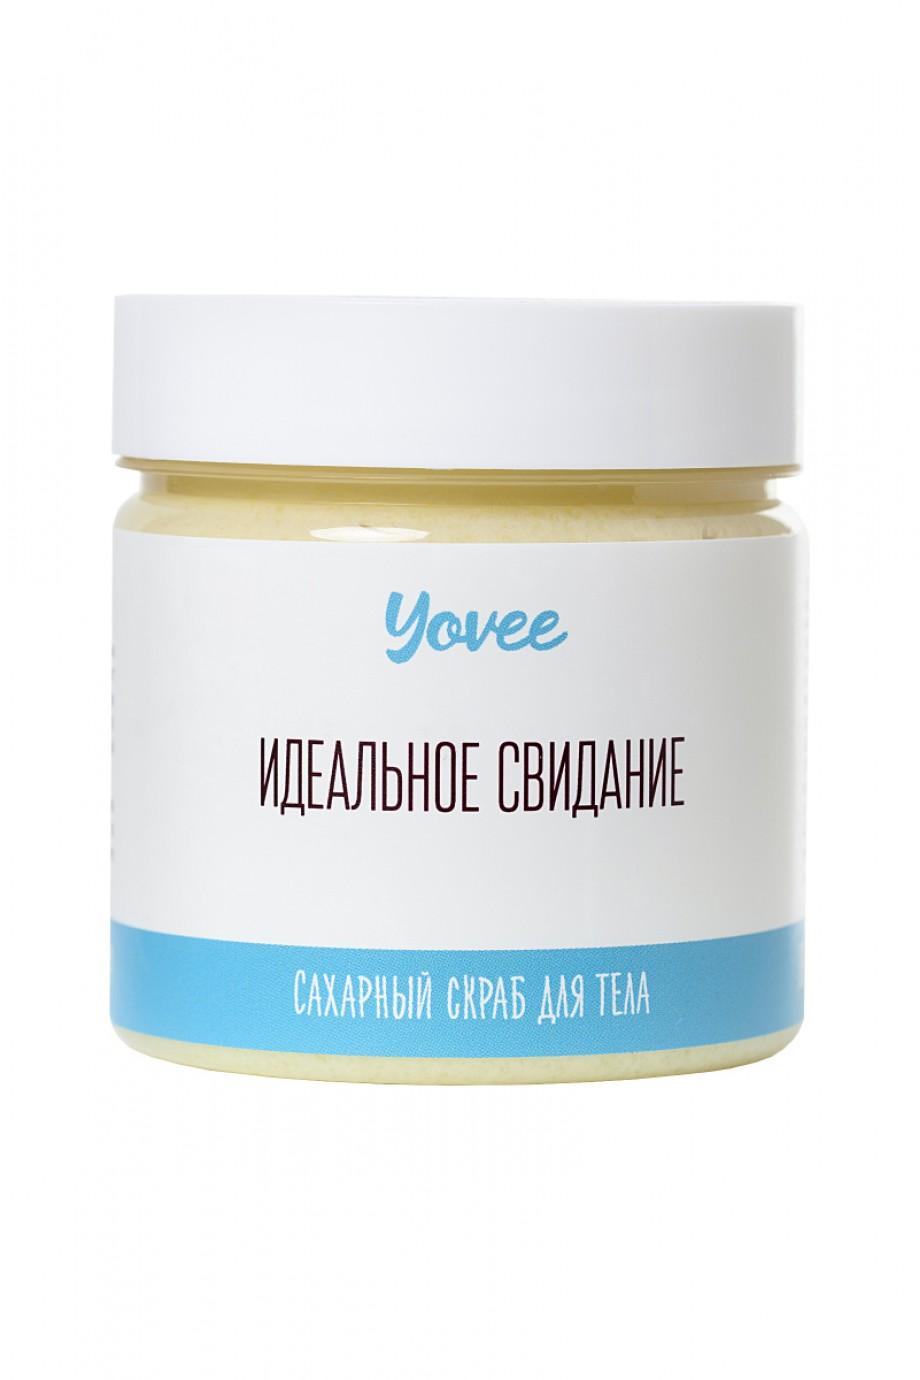 Скраб для тела Yovee by Toyfa «Ароматный», с ароматом дыни